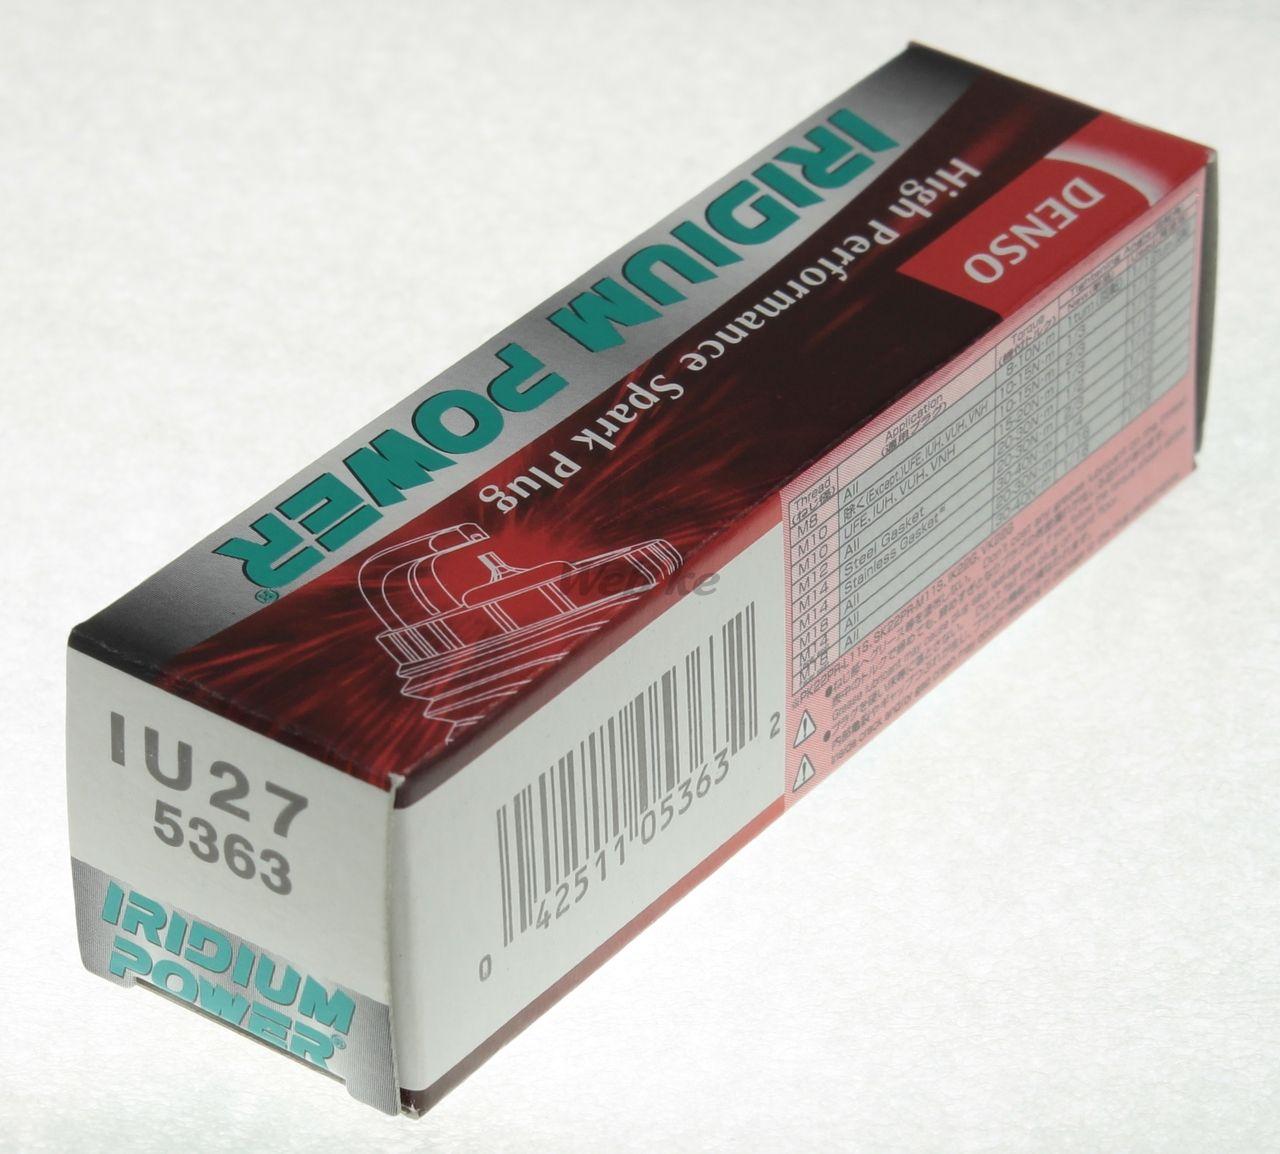 【DENSO】銥合金 火星塞 IU27 - 「Webike-摩托百貨」